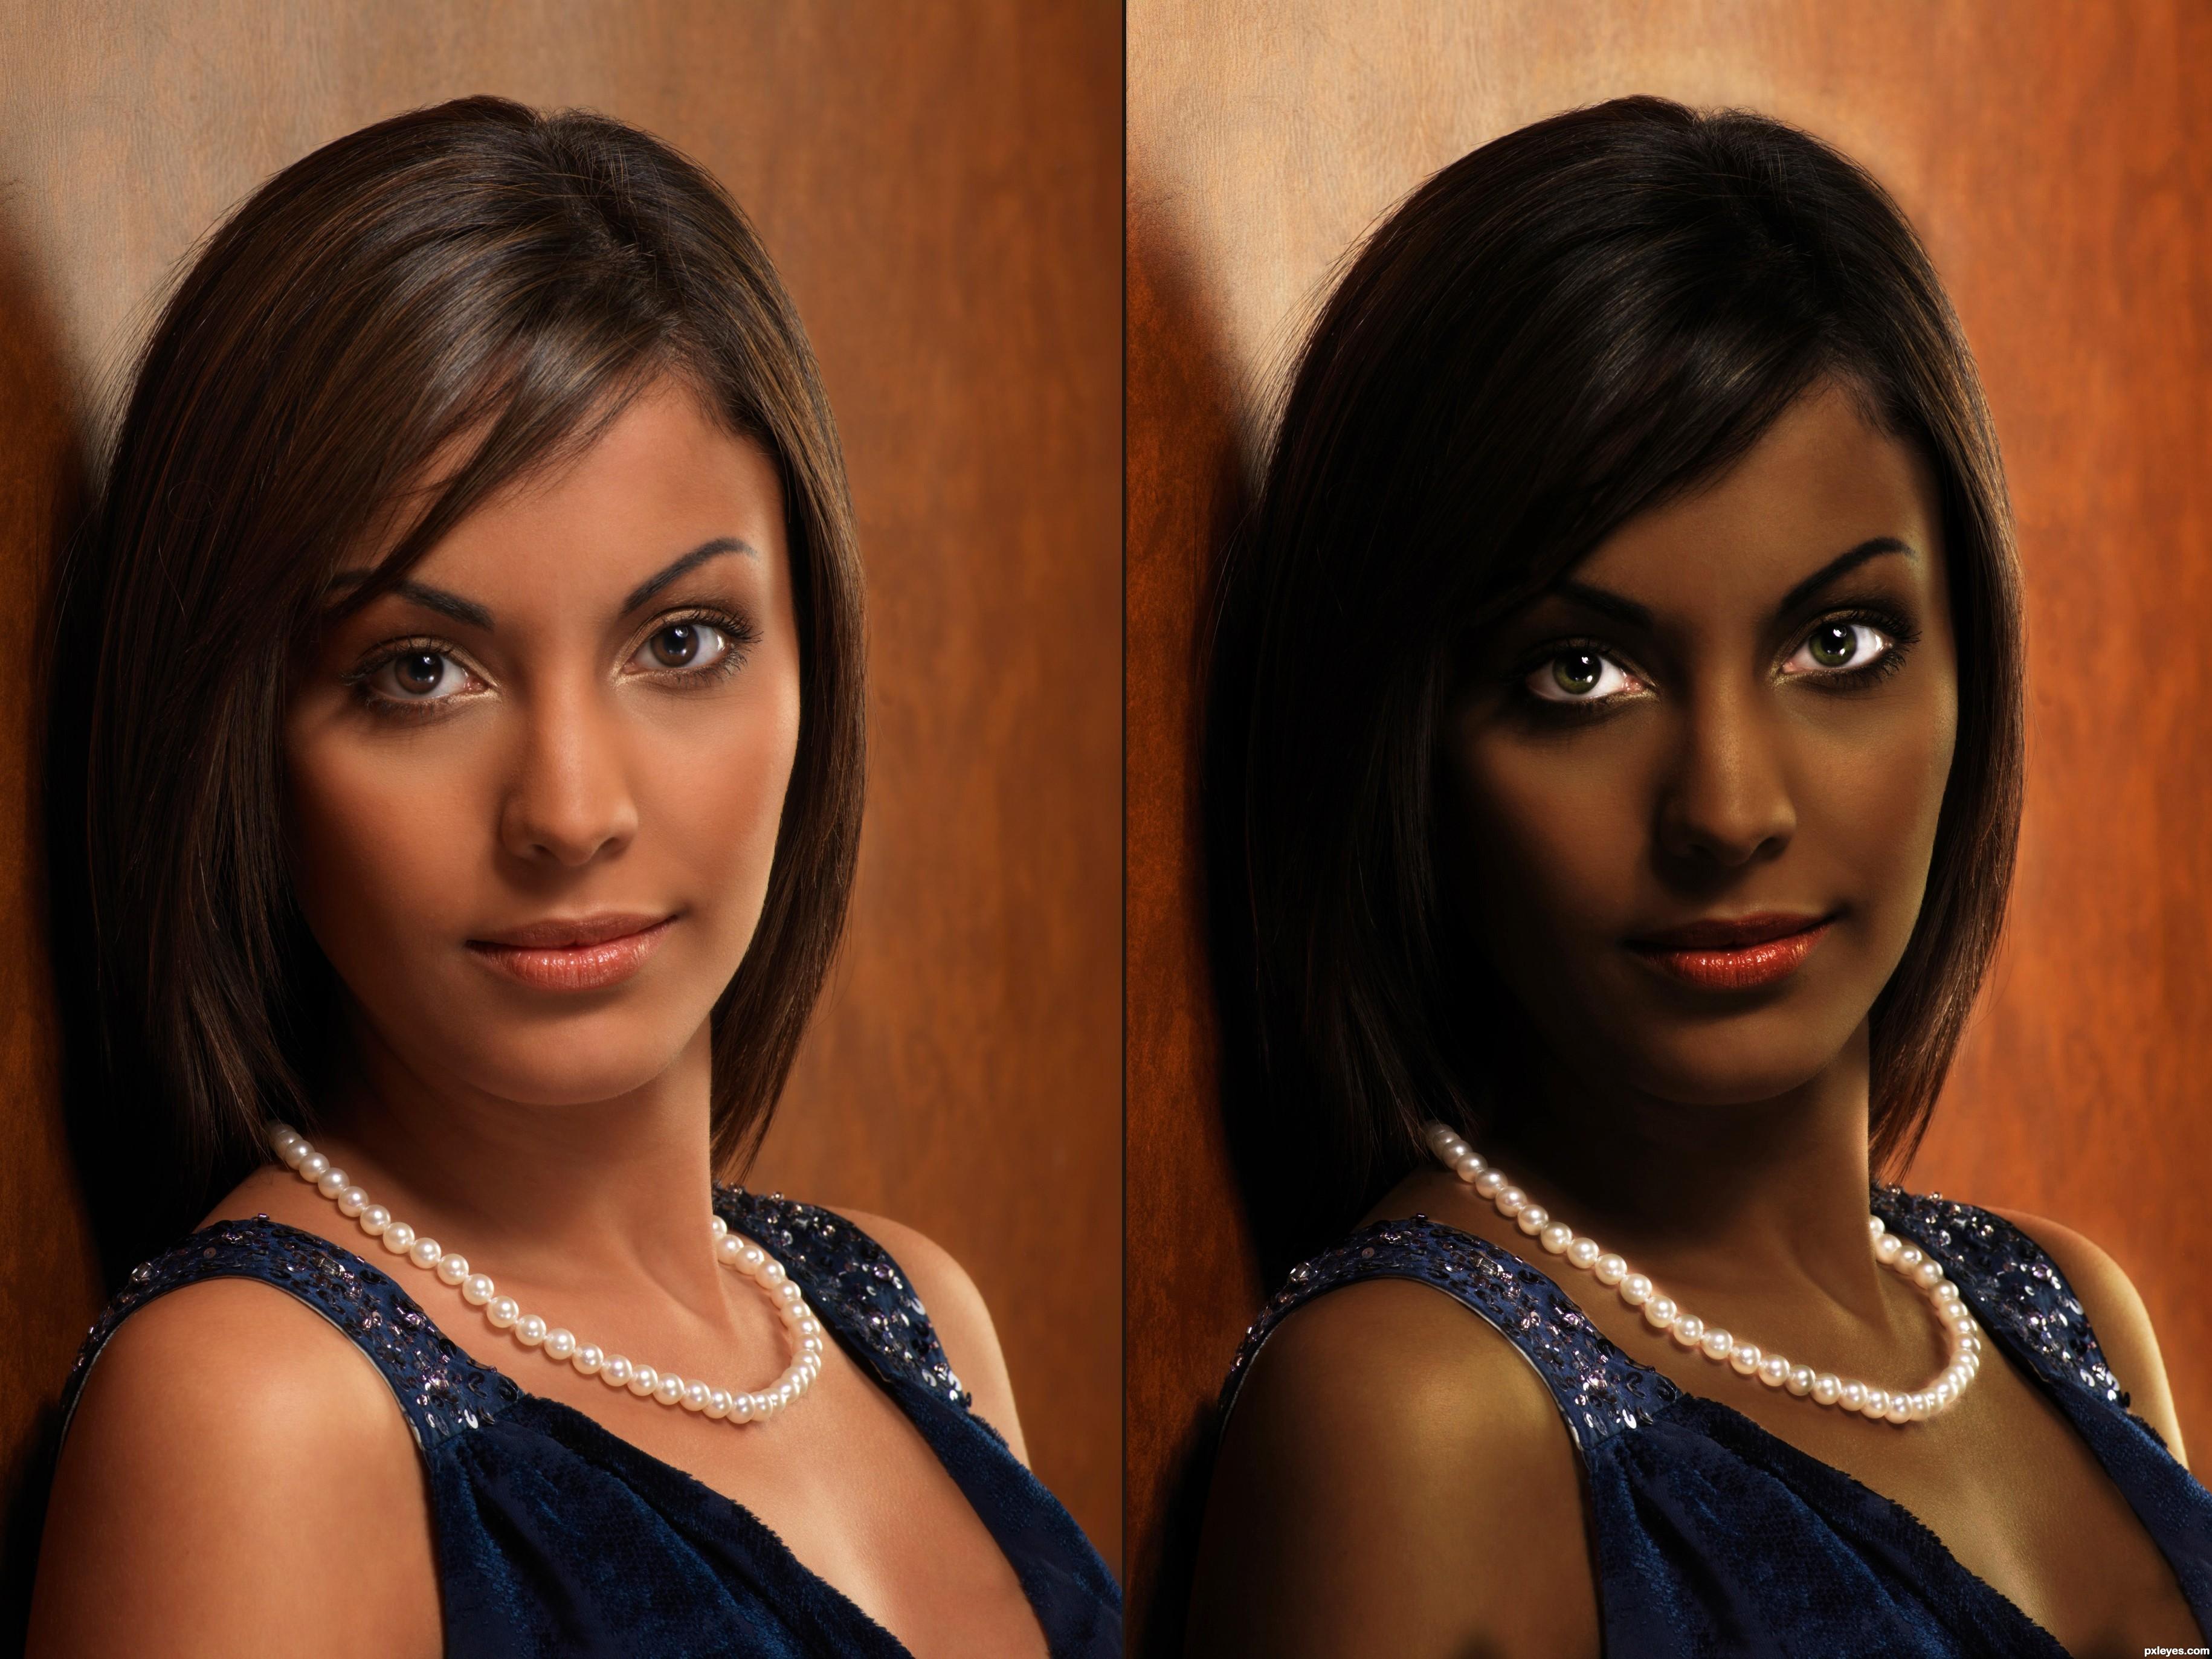 Race Change Makeup White To Black Makeup Photography